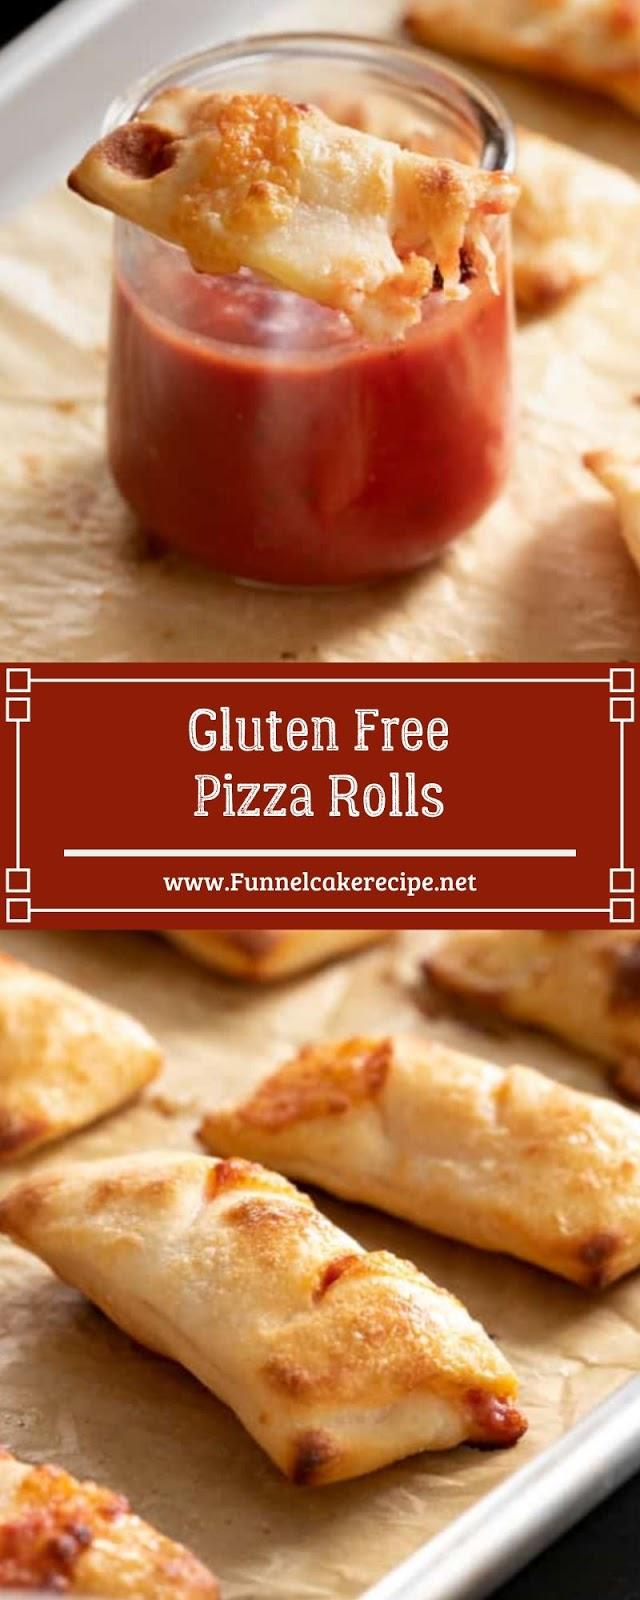 Gluten Free Pizza Rolls